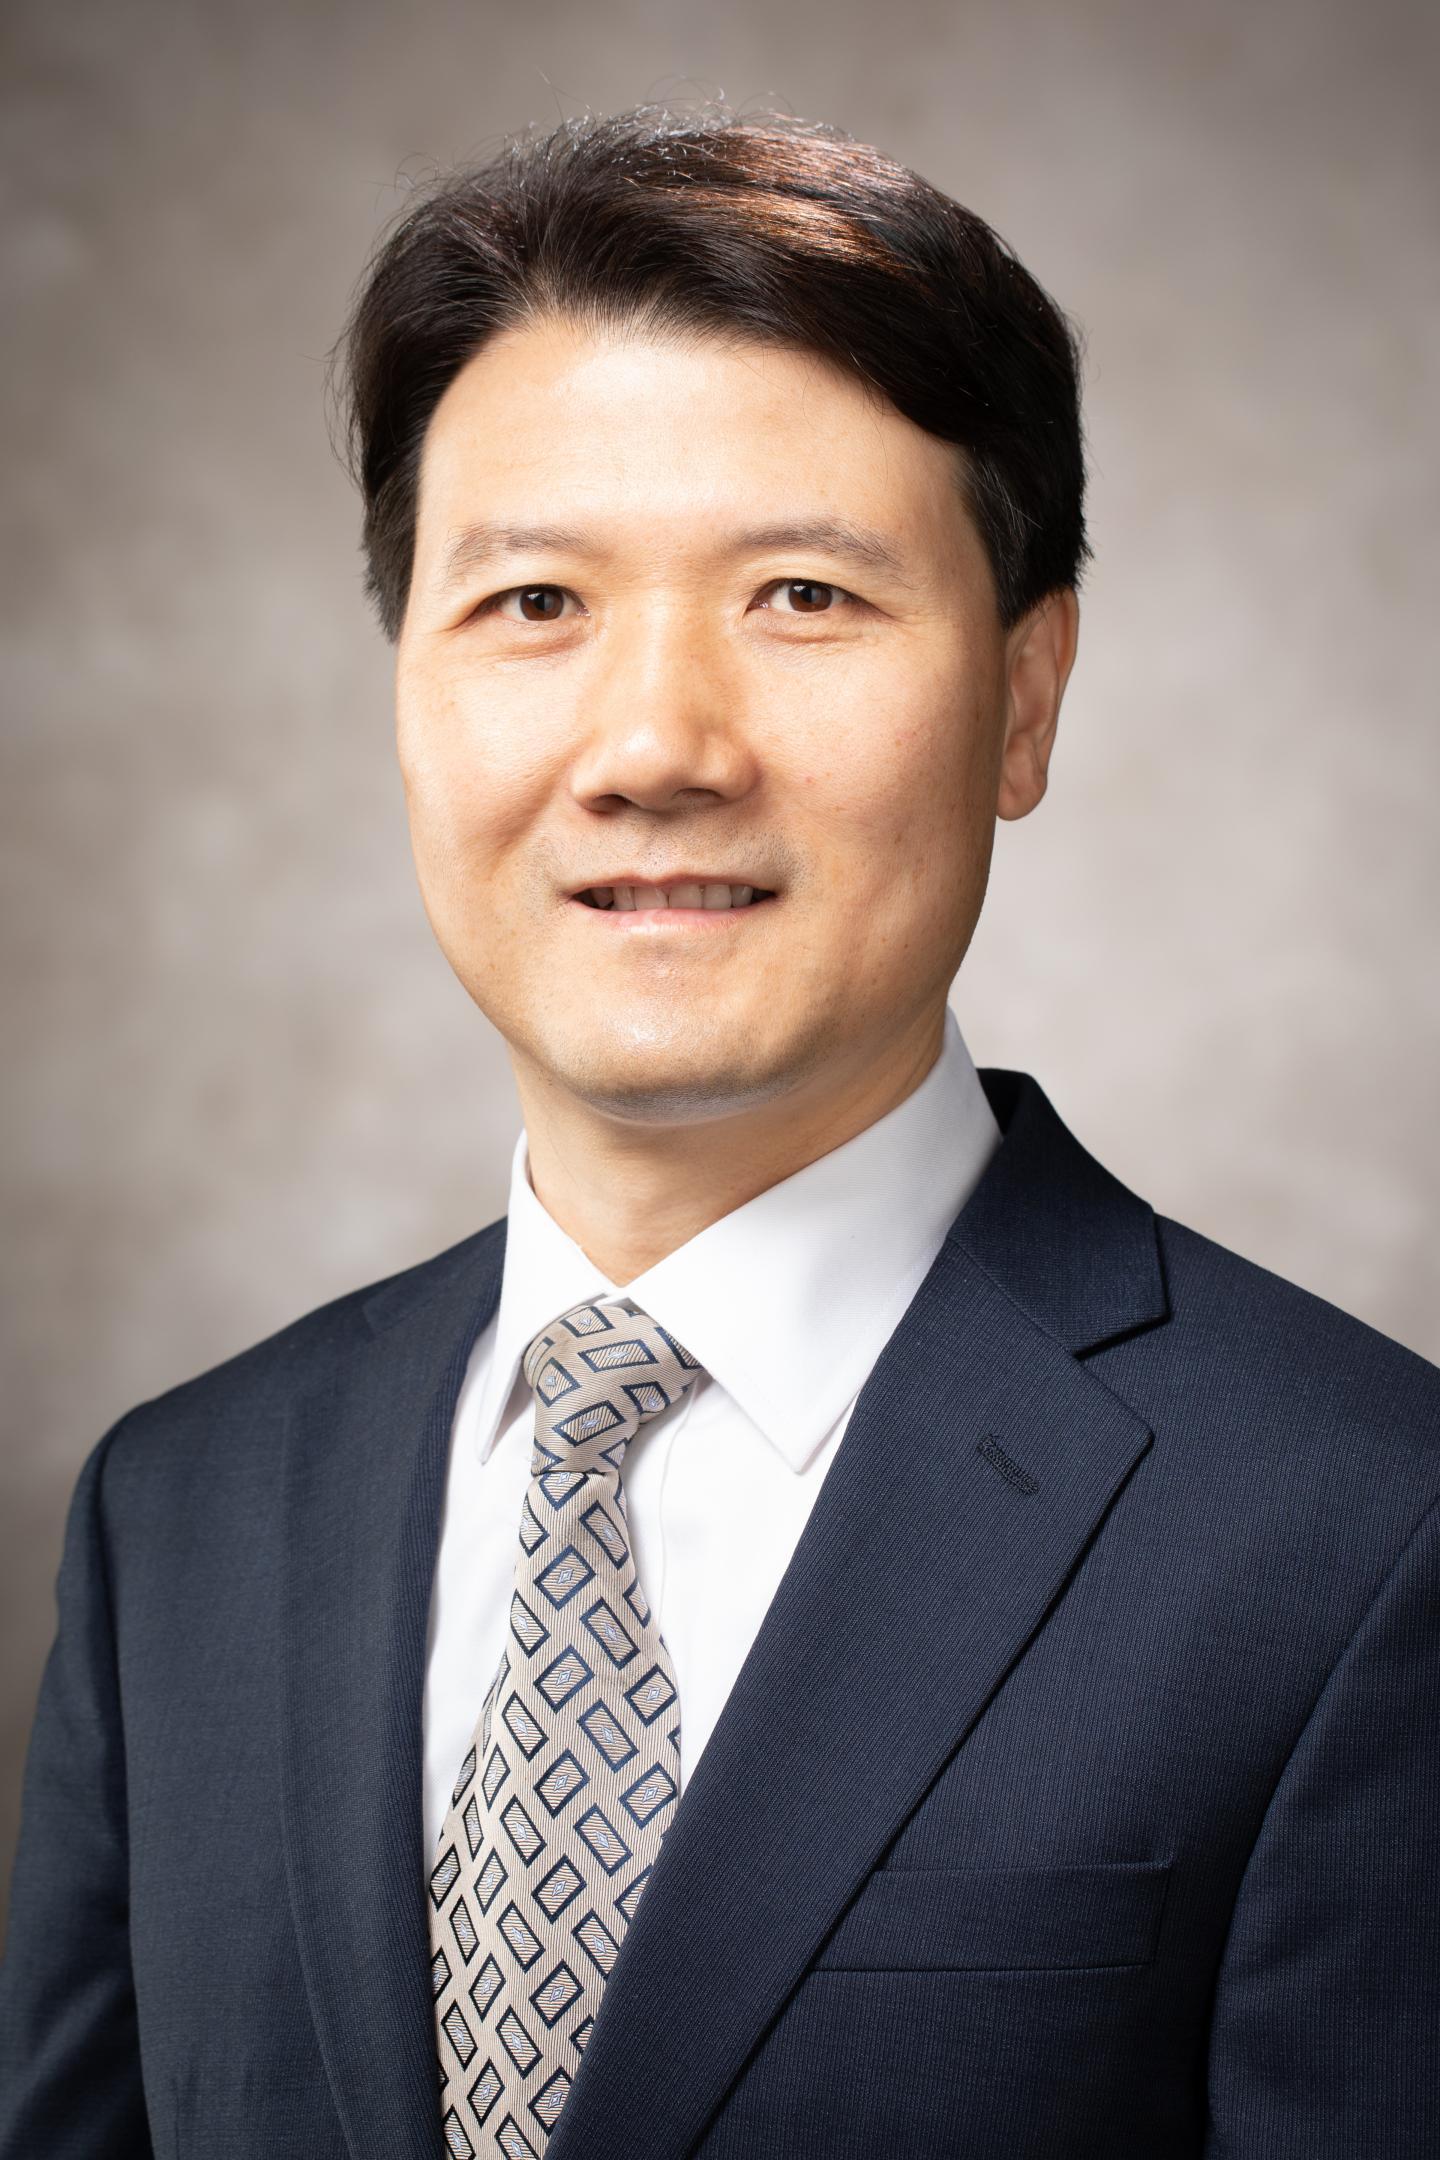 Justin Zhan University of Arkansas